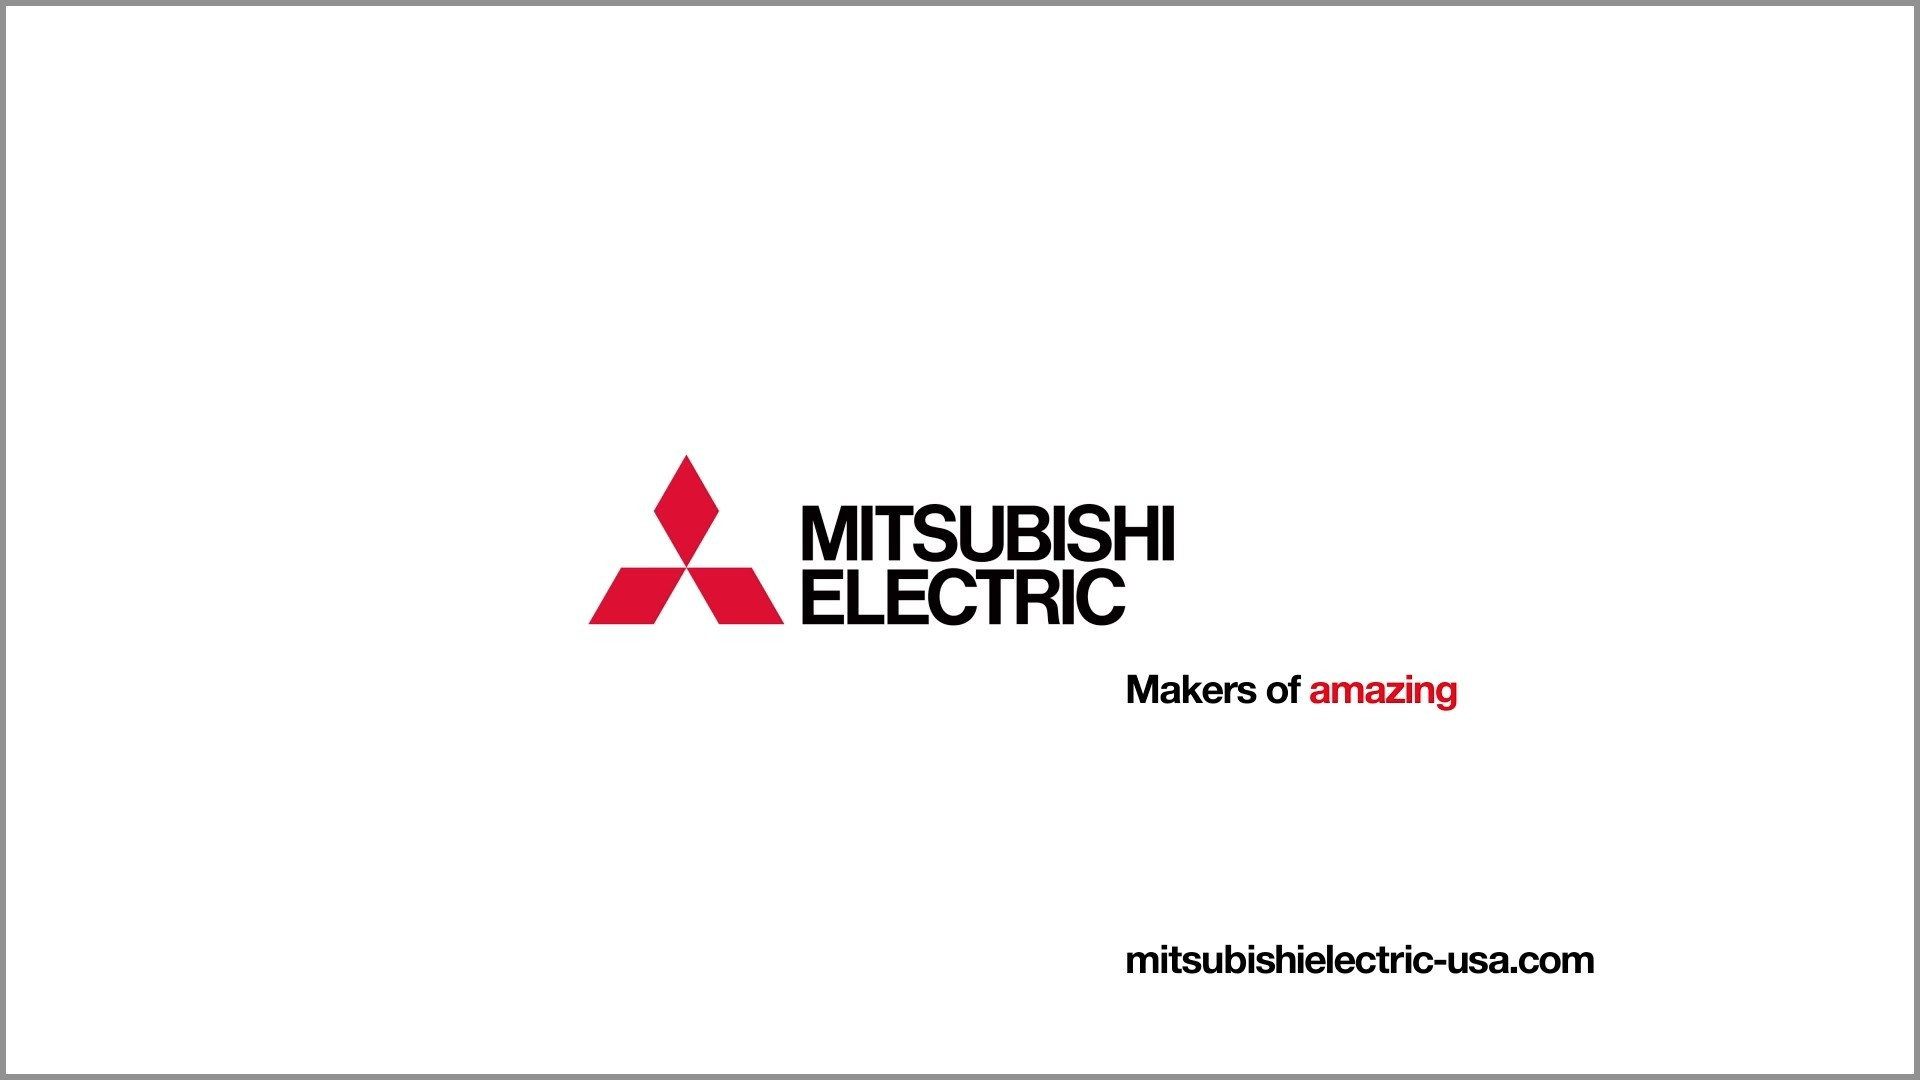 Mitsubishi electric logo – Mitsubishi Electric Makers Of Amazing U S Version